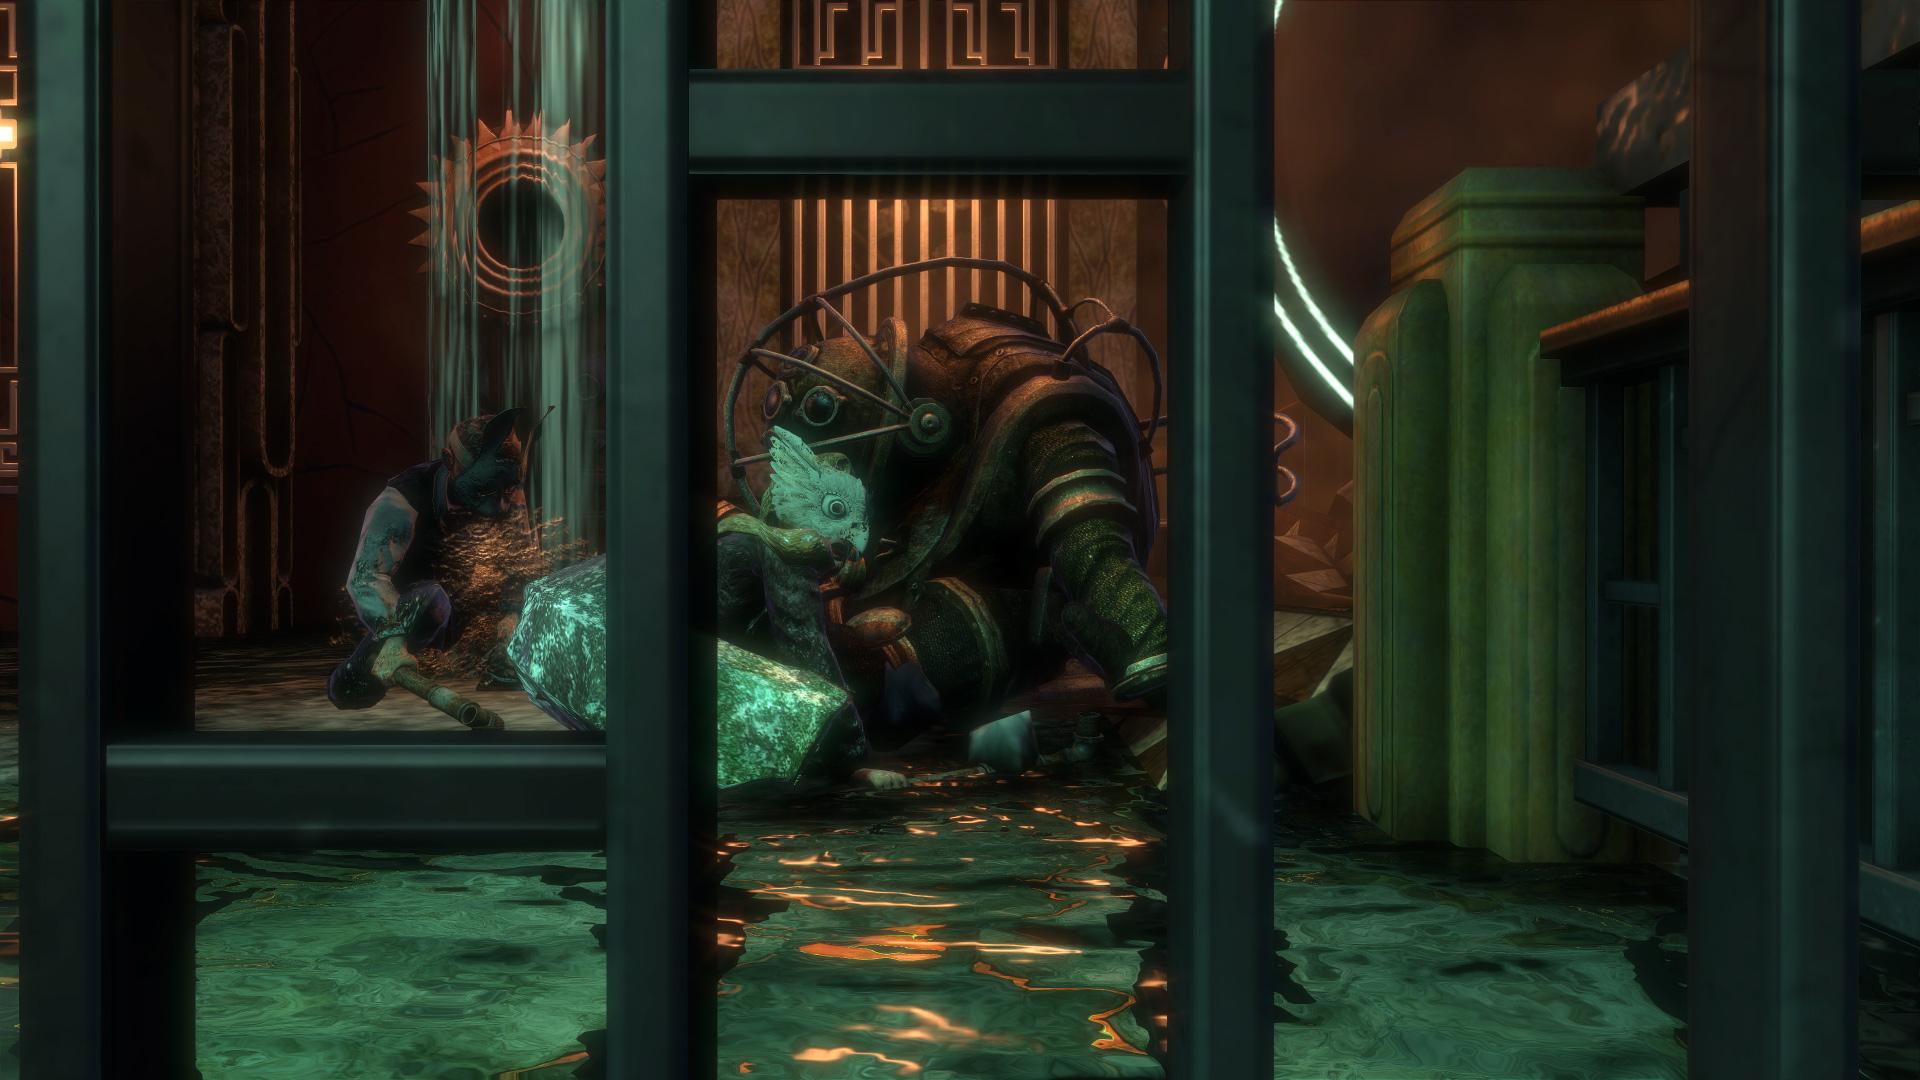 Bioshock HD Wallpaper | Background Image | 1920x1080 | ID ...